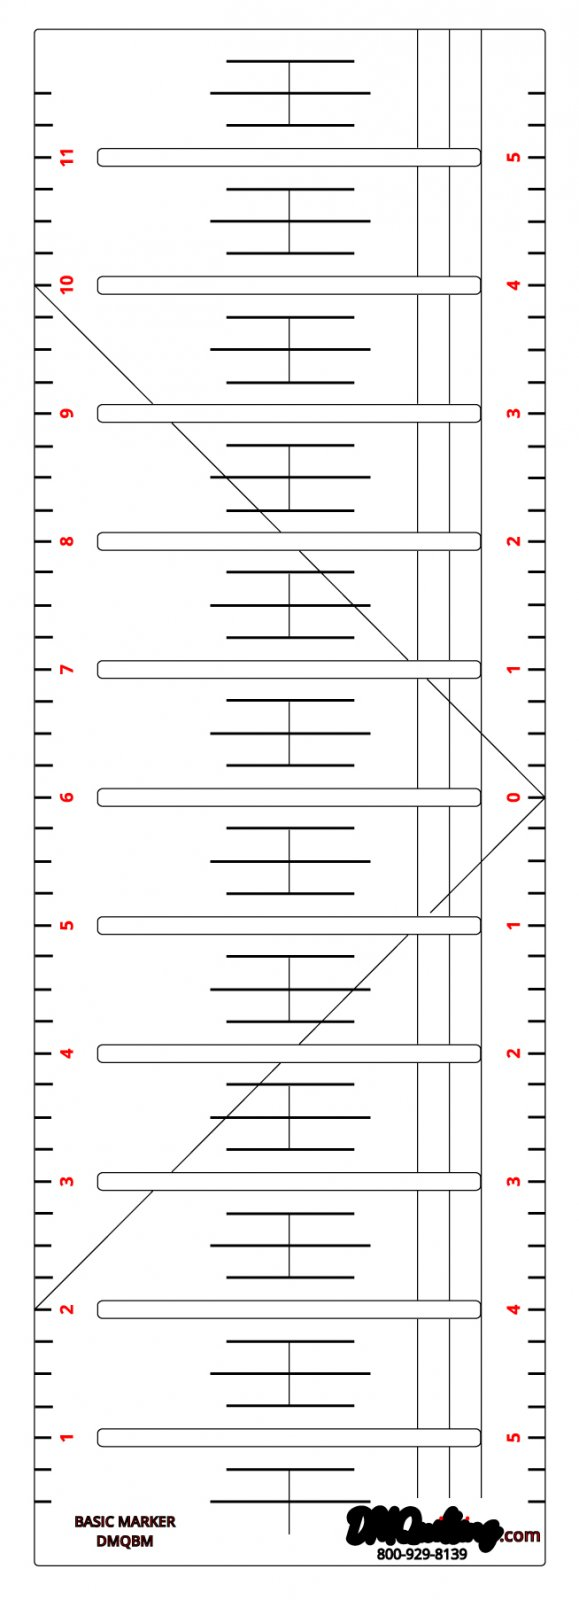 Sew Steady DM Basic Line Marker